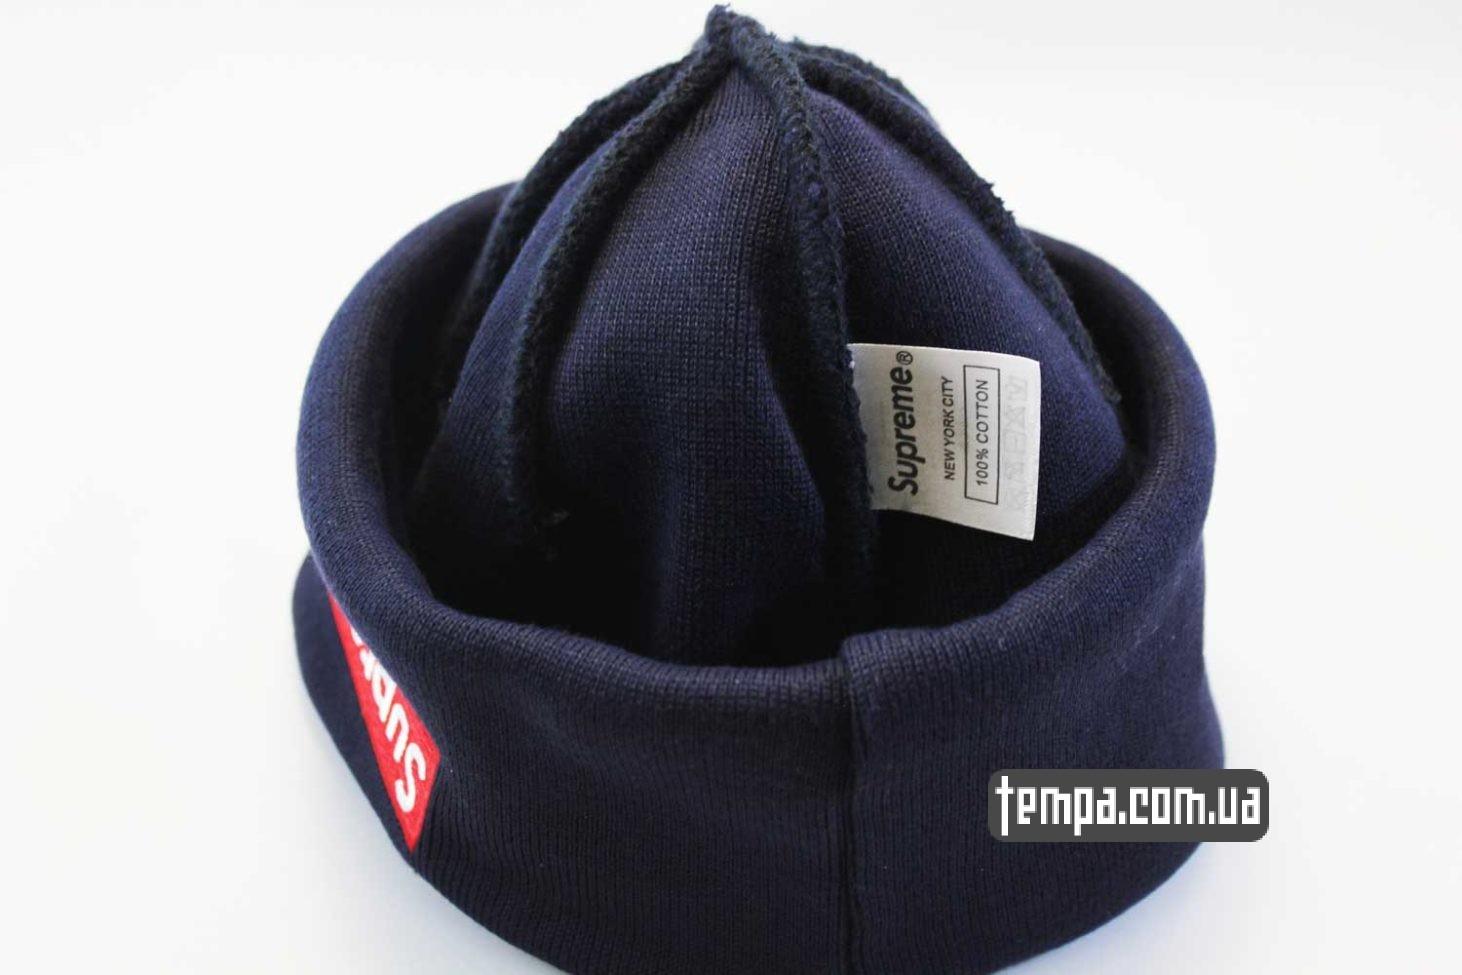 нью эра супим магазин шапка beanie SUPREME New Era blue голубая оригинал